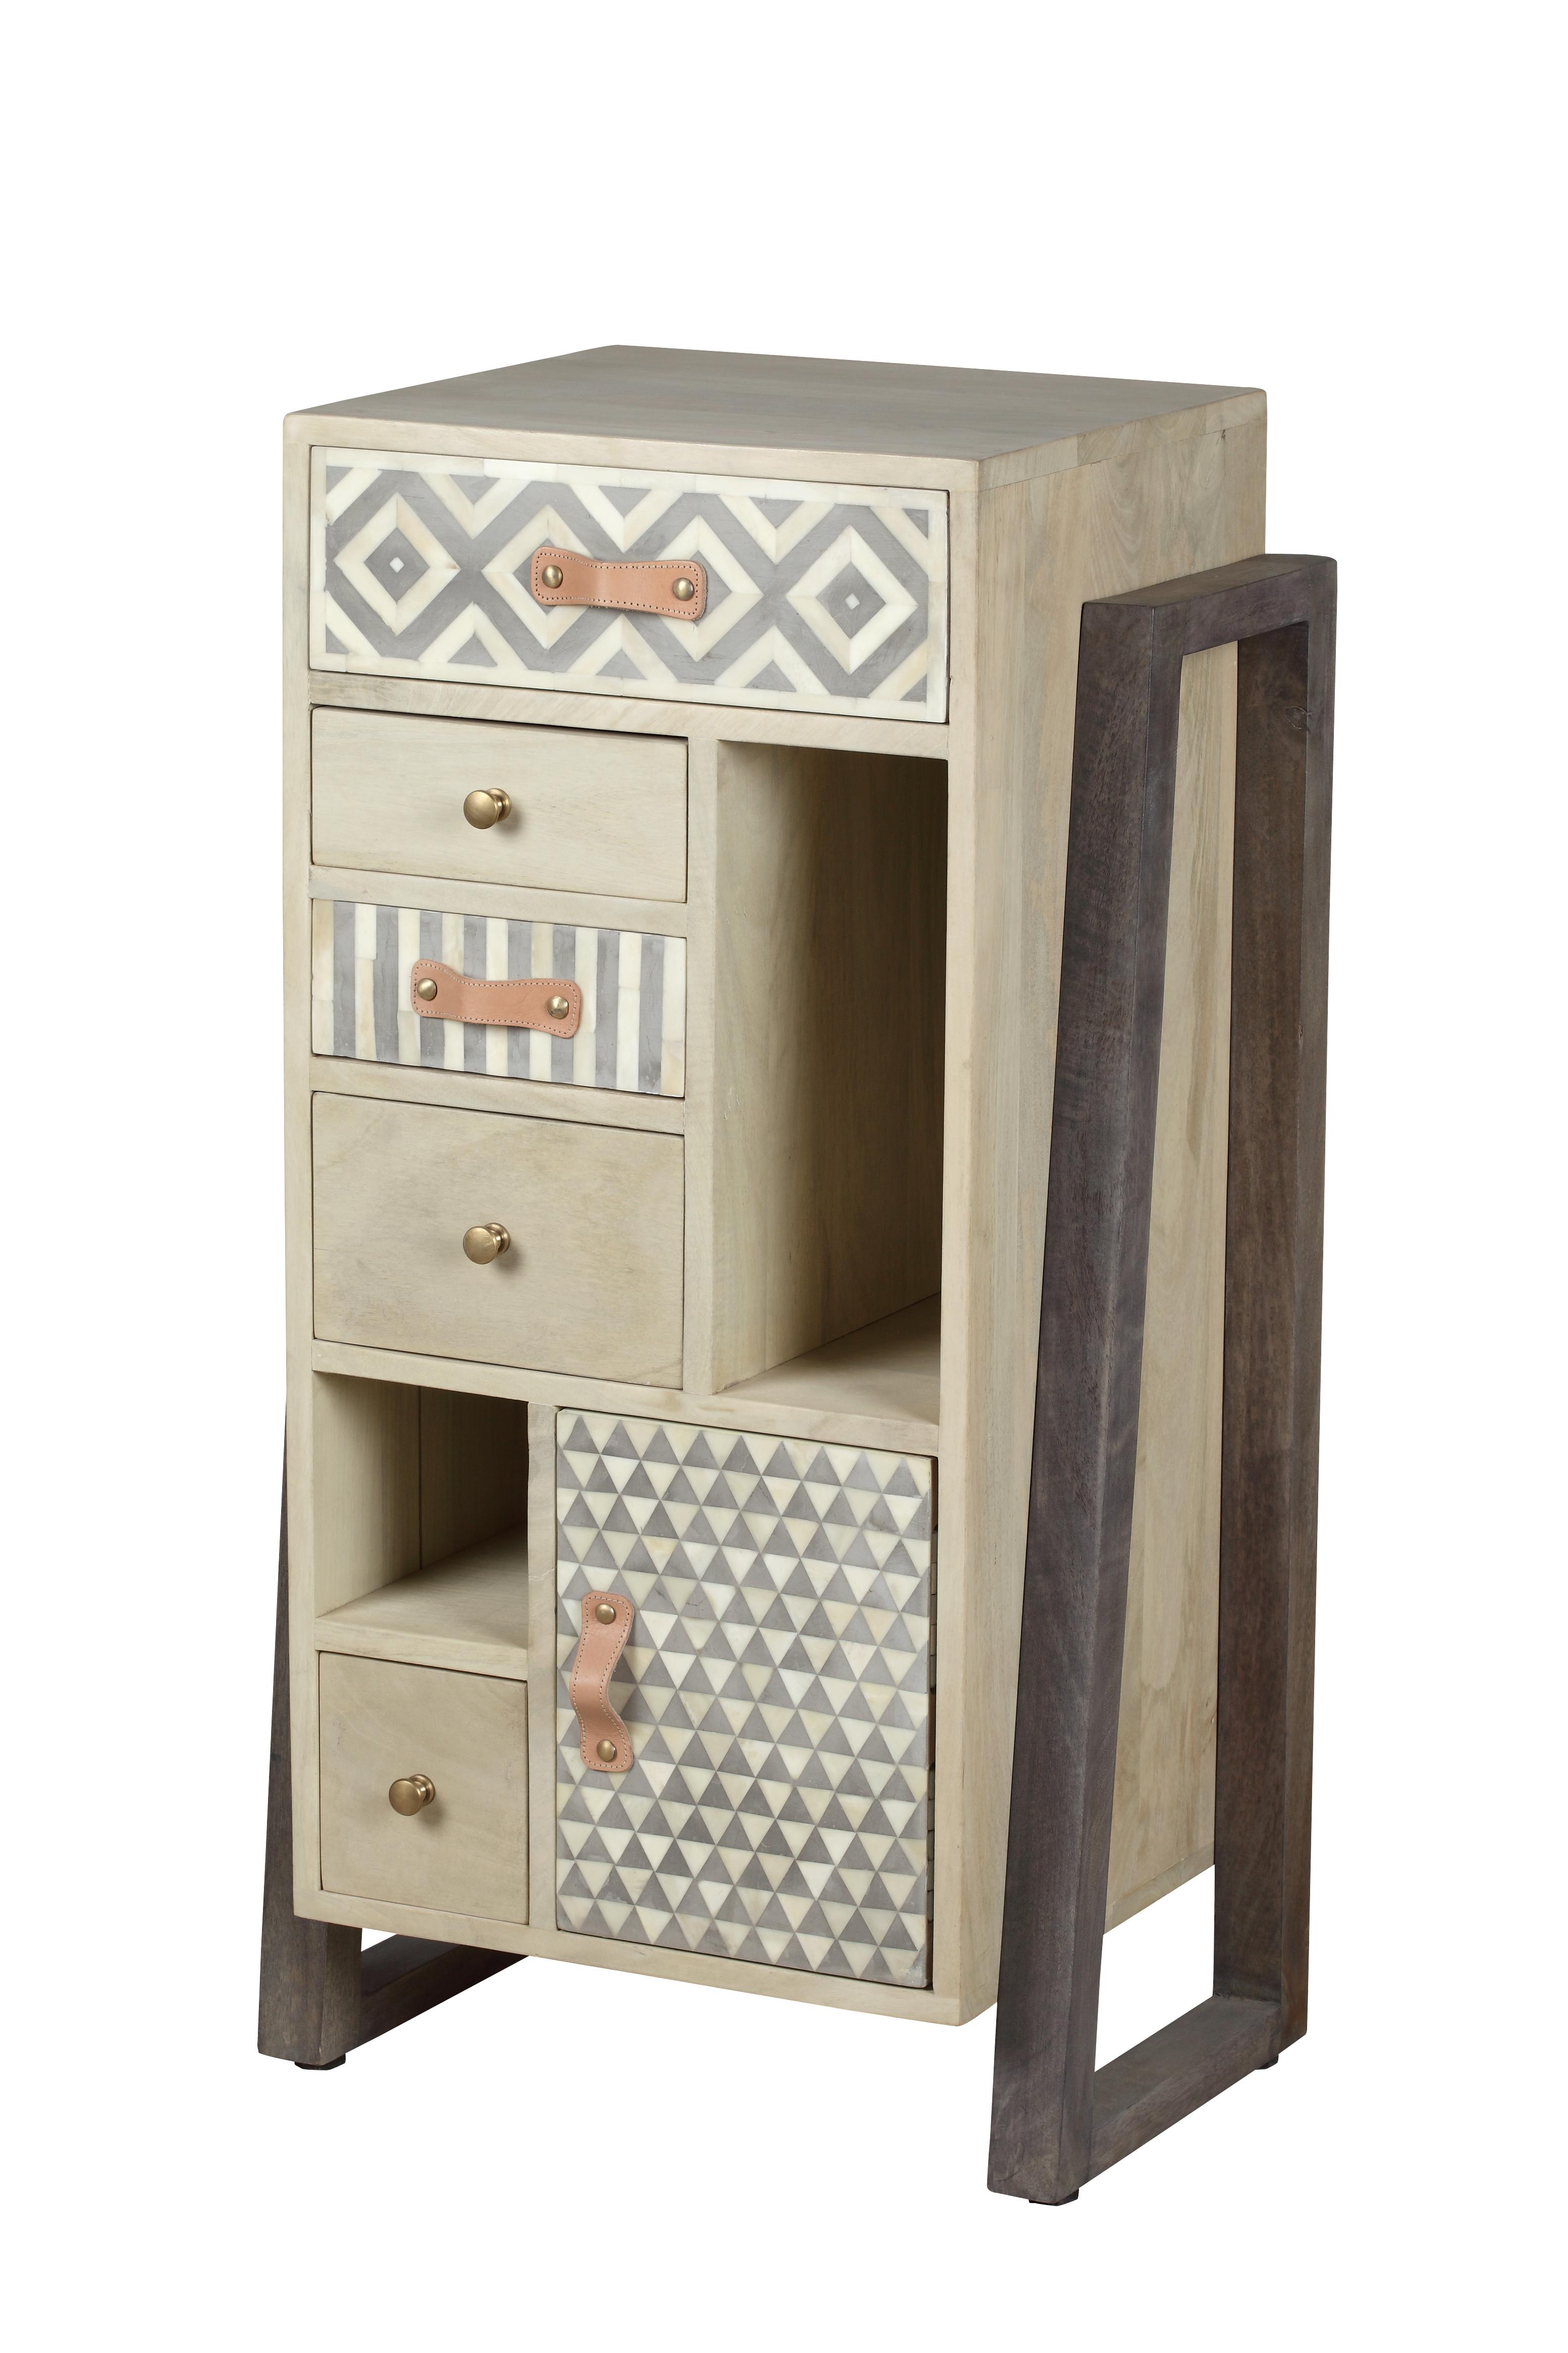 Cabinet din lemn cu 5 sertare si 1 usa Doyle Natural l45xA33xH85 cm